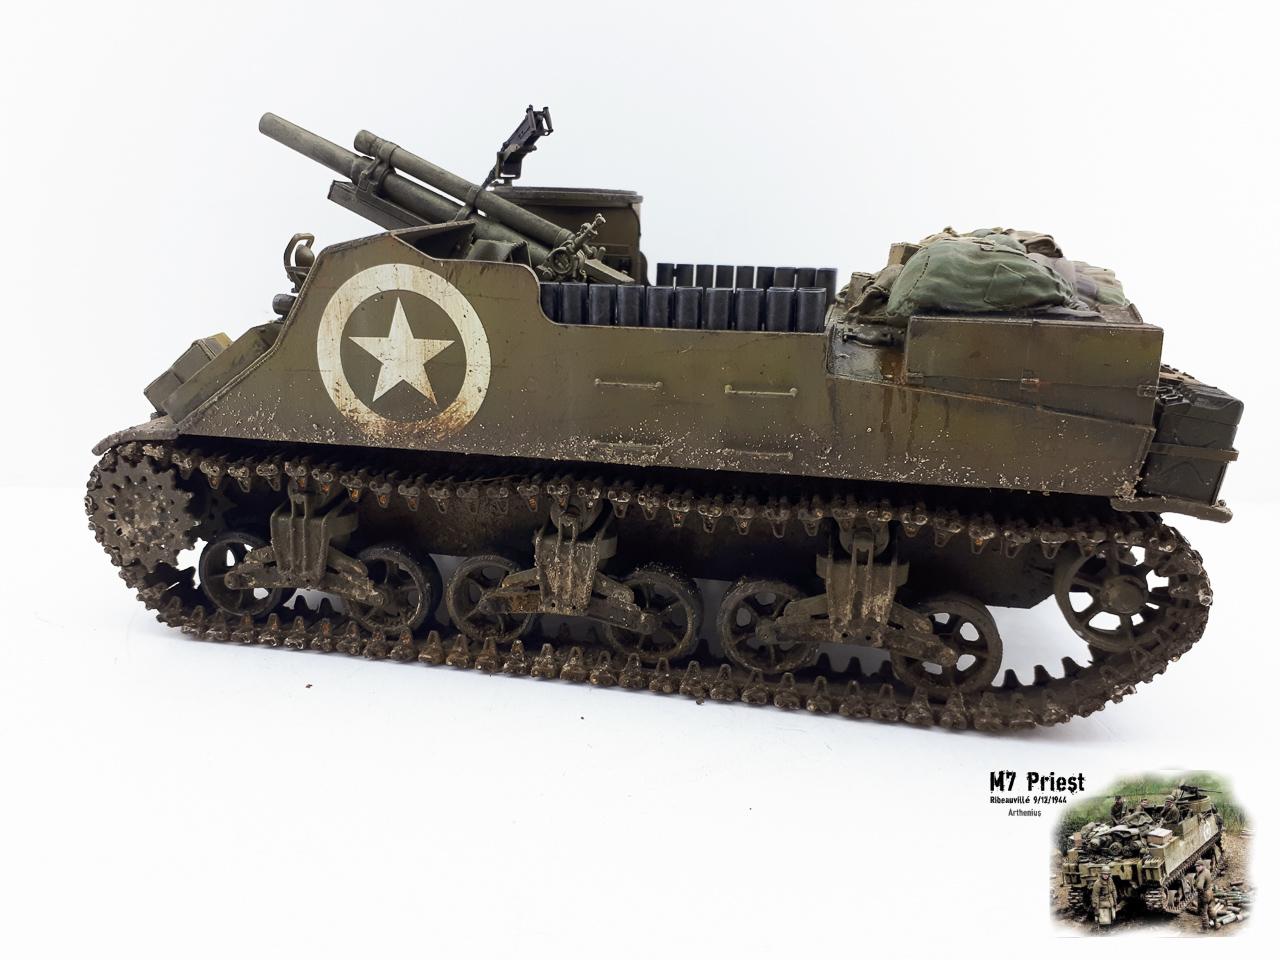 M7 Priest Ribeauvillé 9/12/1944 - Page 3 2018-119